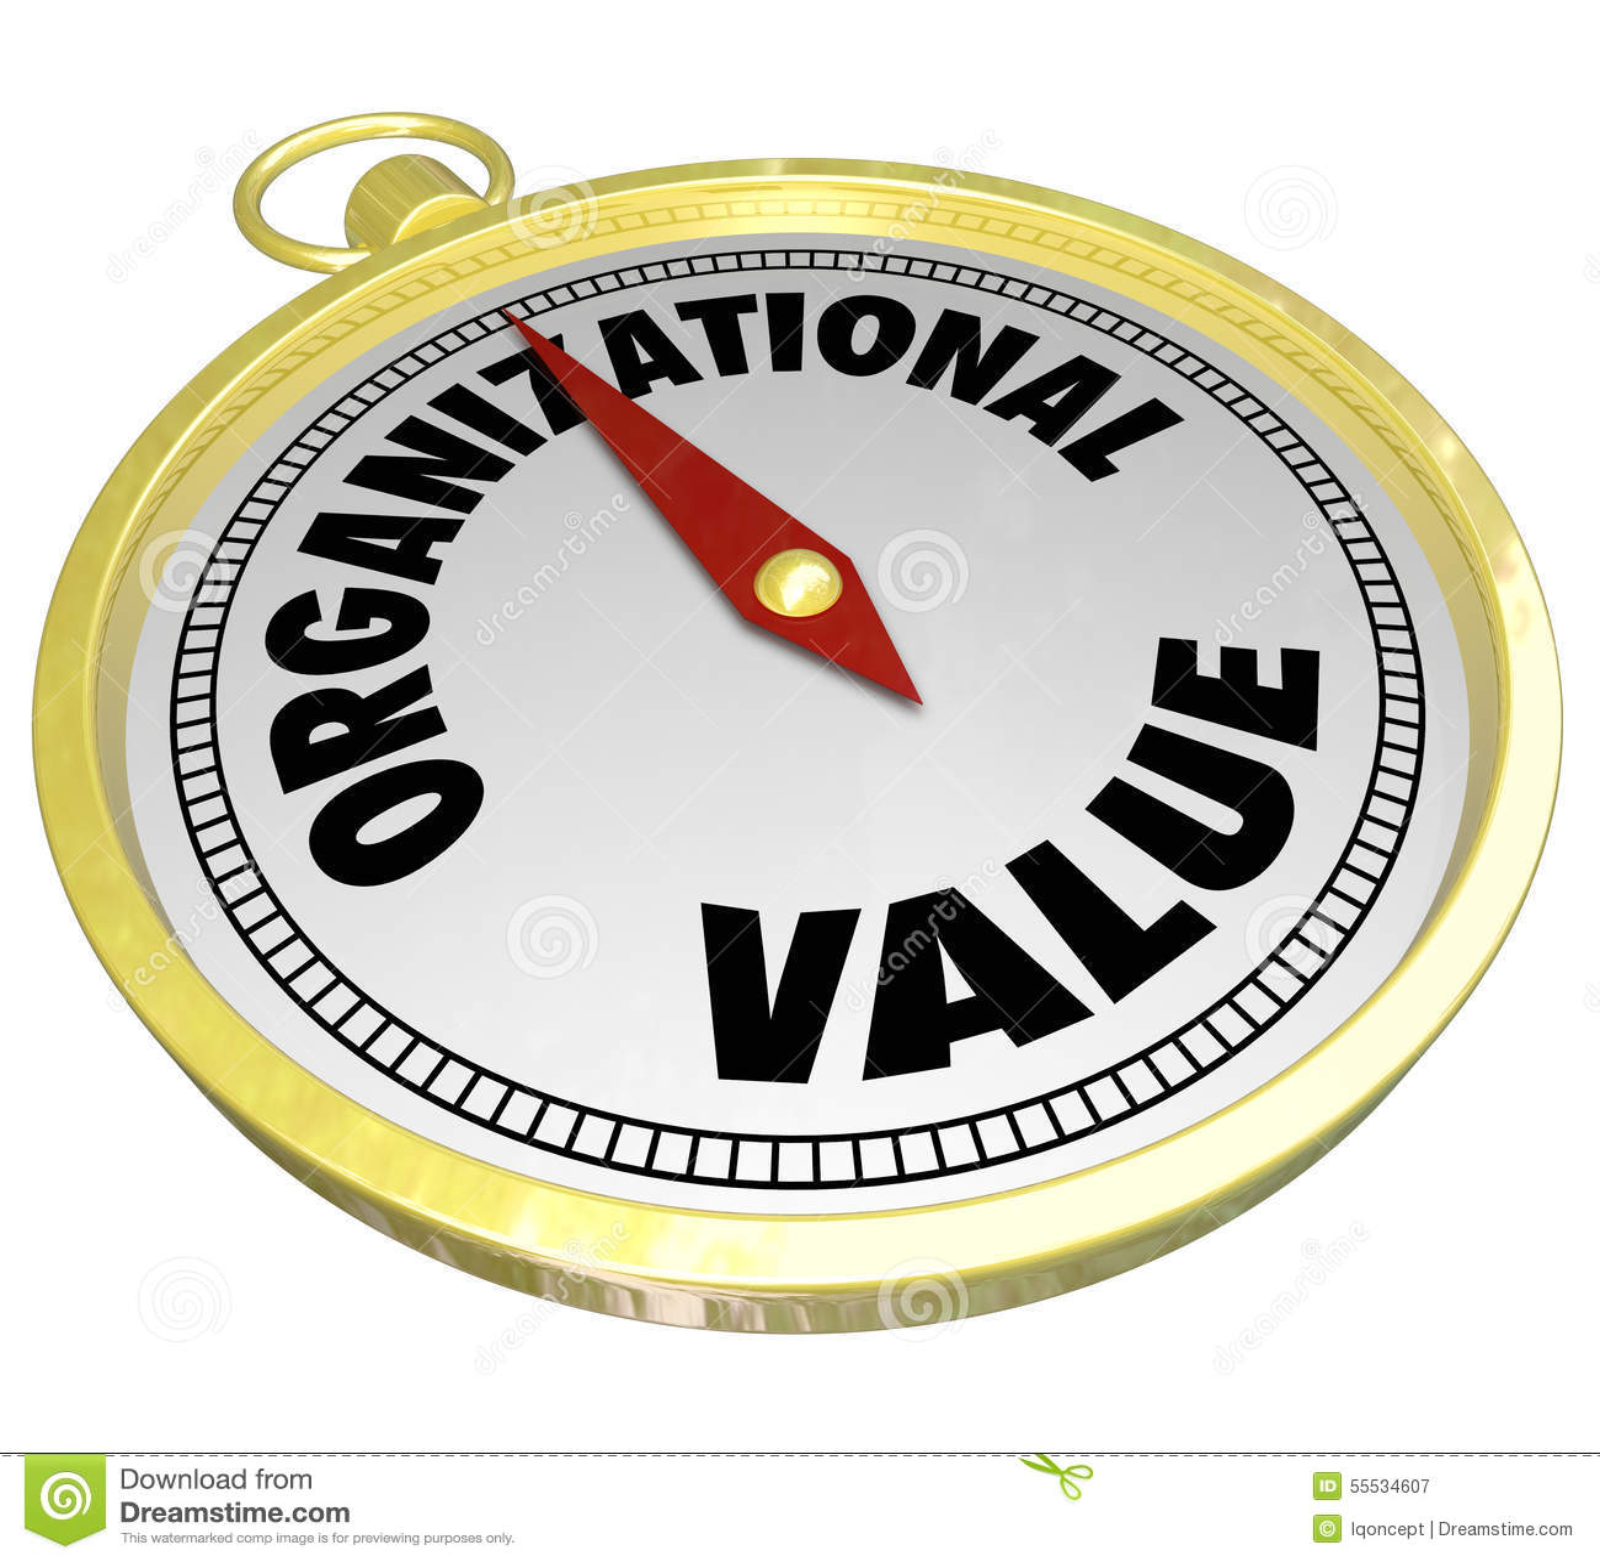 Image result for Organizational Value